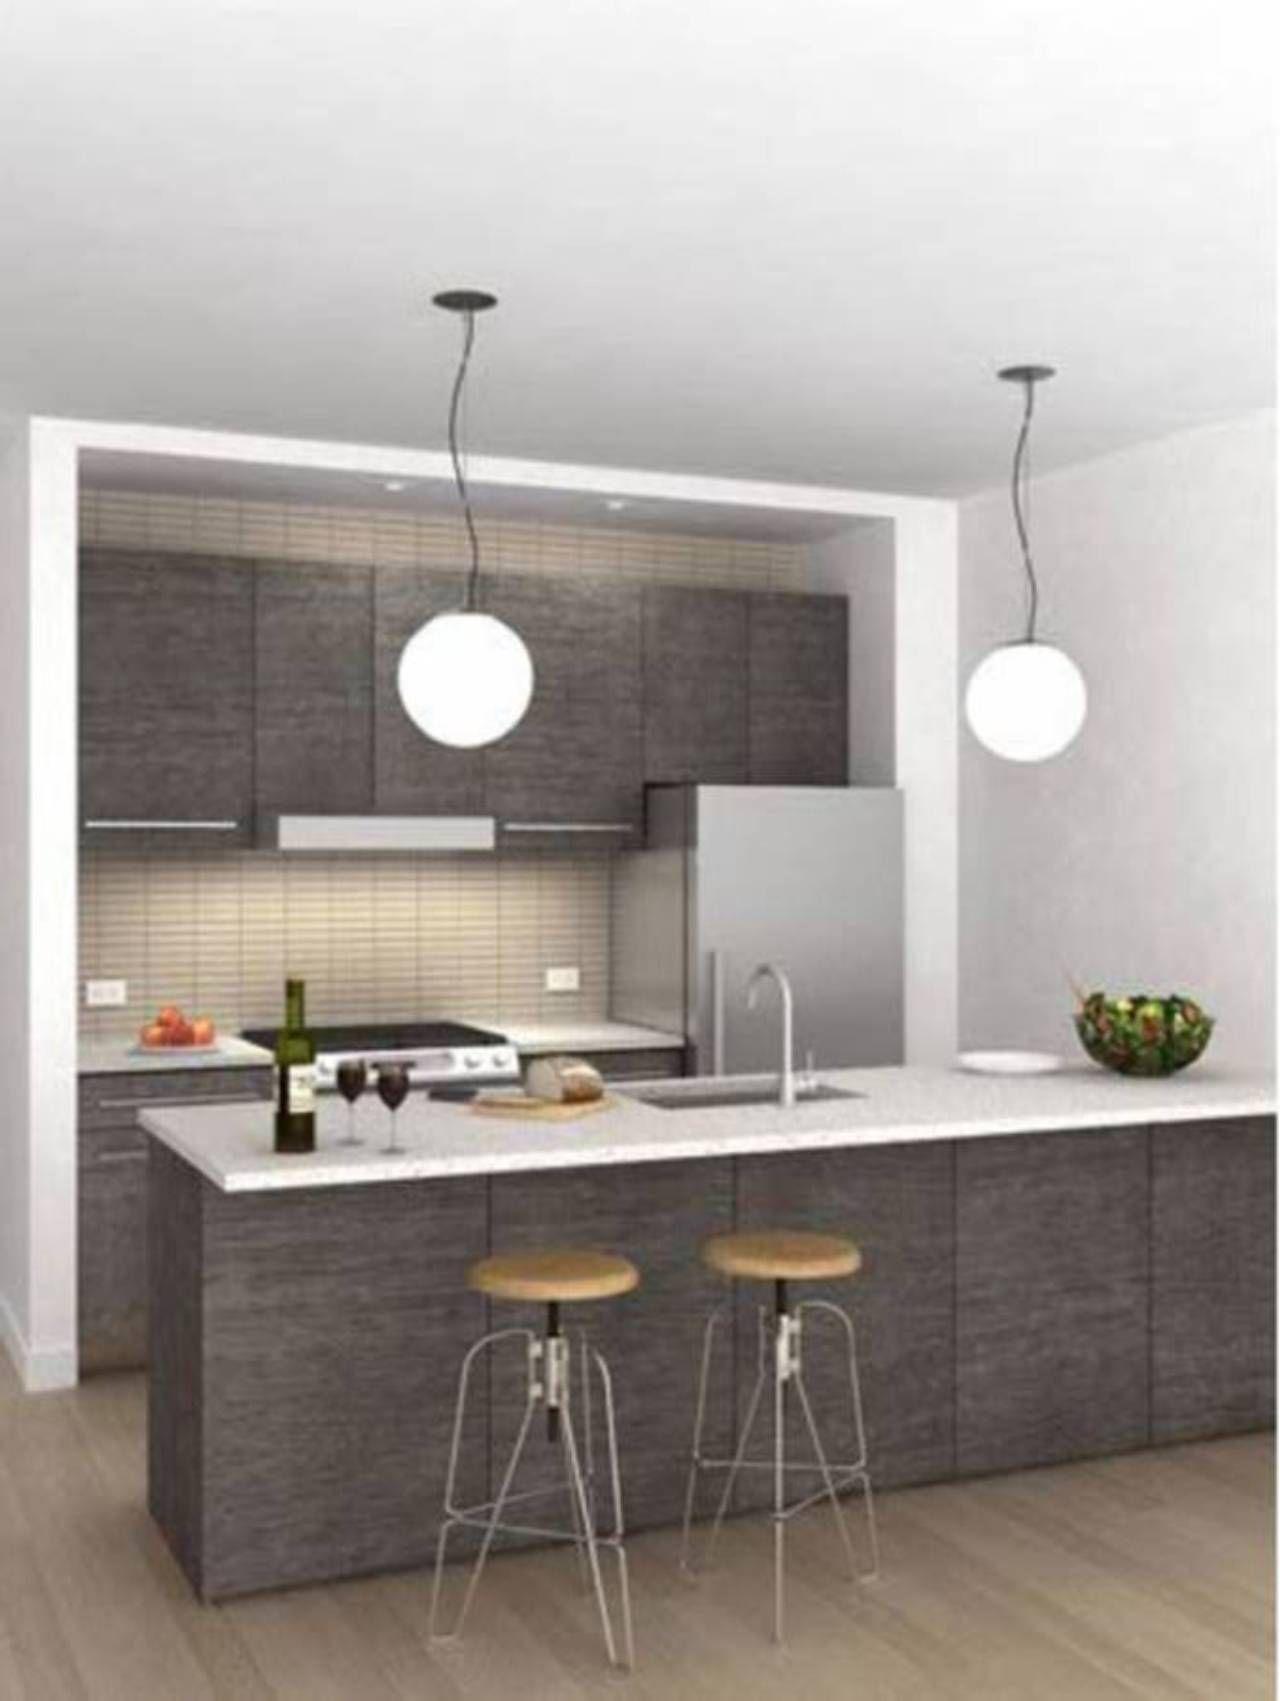 White Grey Small Kitchen Designs 2013 With Pendant